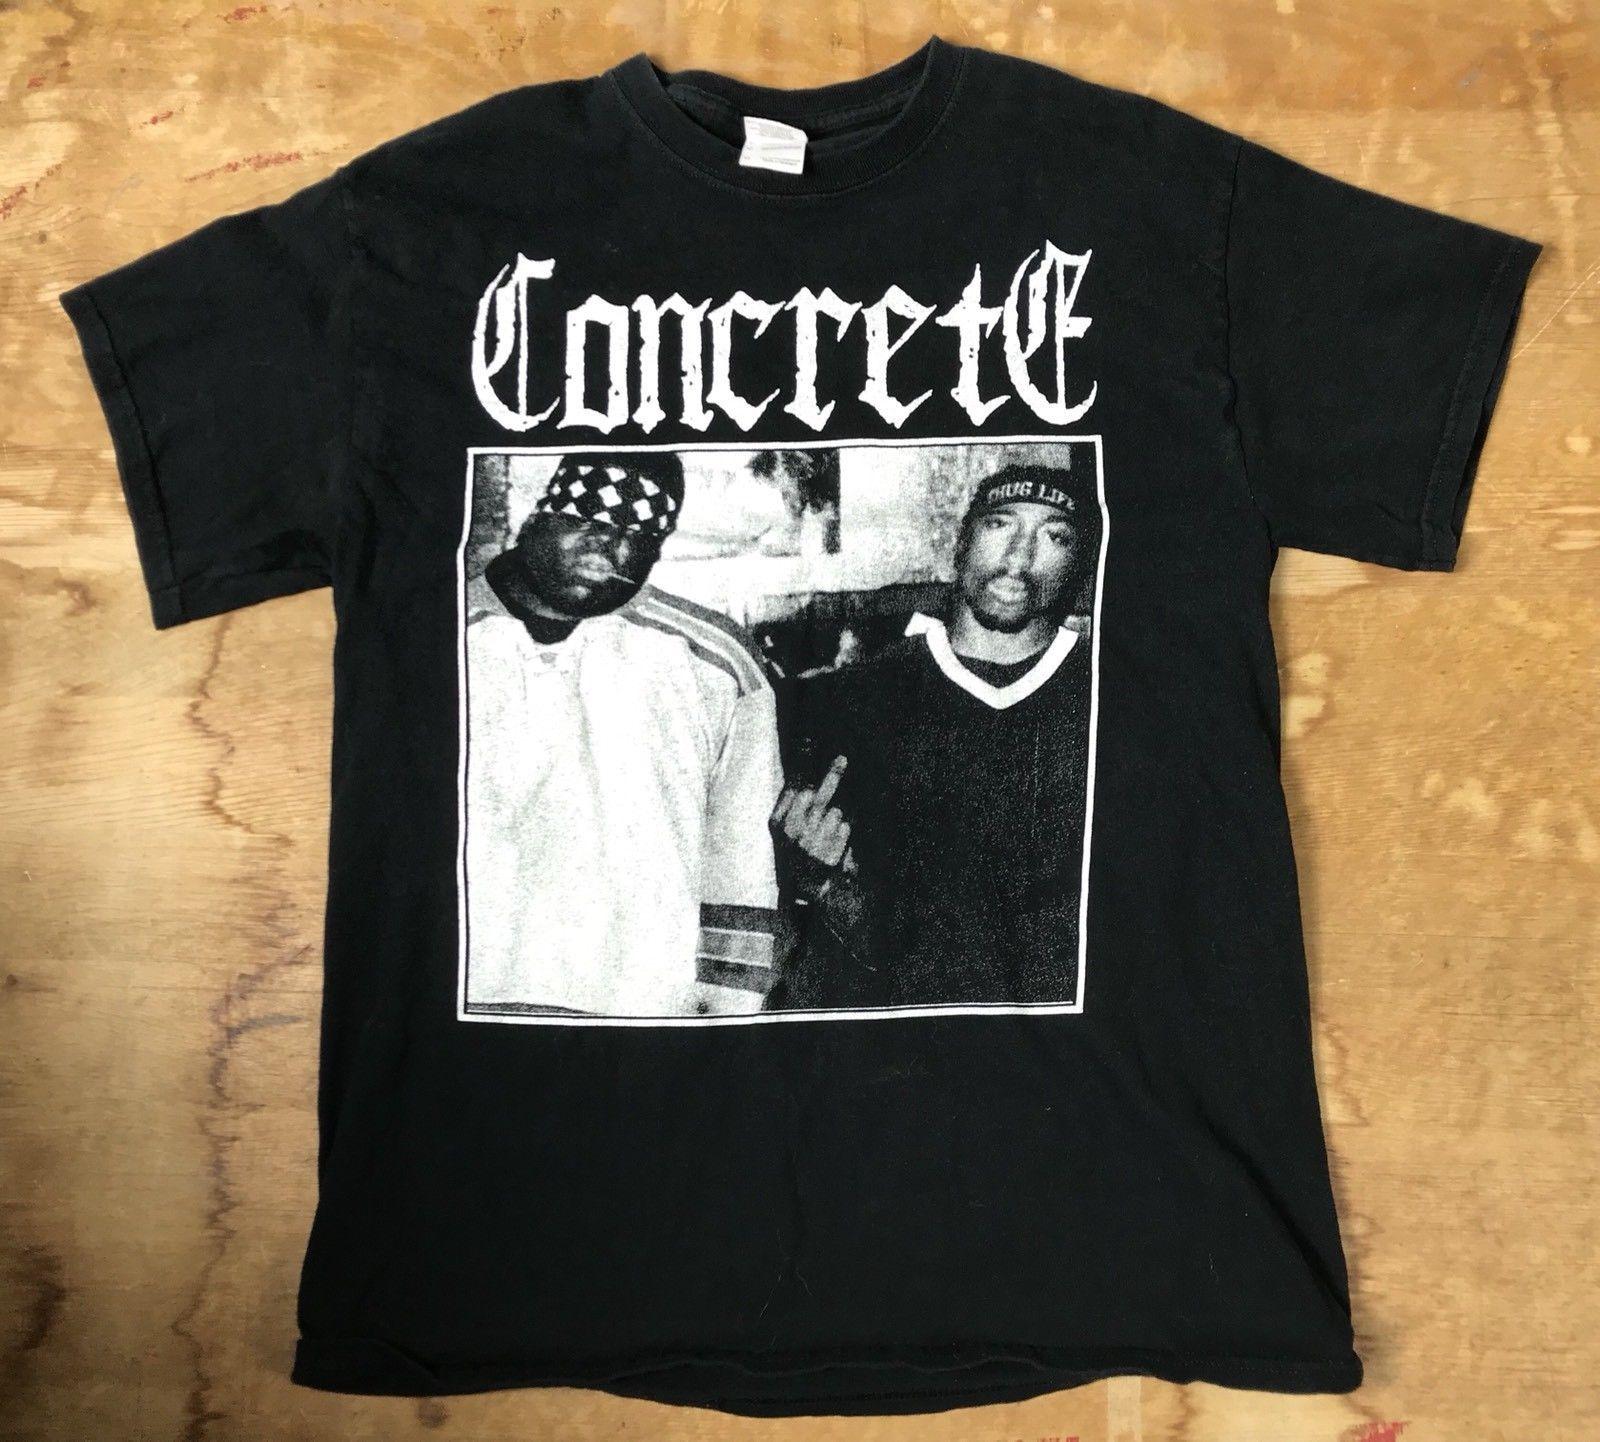 2fdd74695 VTG 90s Tupac Biggie Smalls T Shirt Concrete East And West Unite ULTRA RARE  M Men Women Unisex Fashion Tshirt Crazy T Shirts Designs Ridiculous T Shirt  From ...